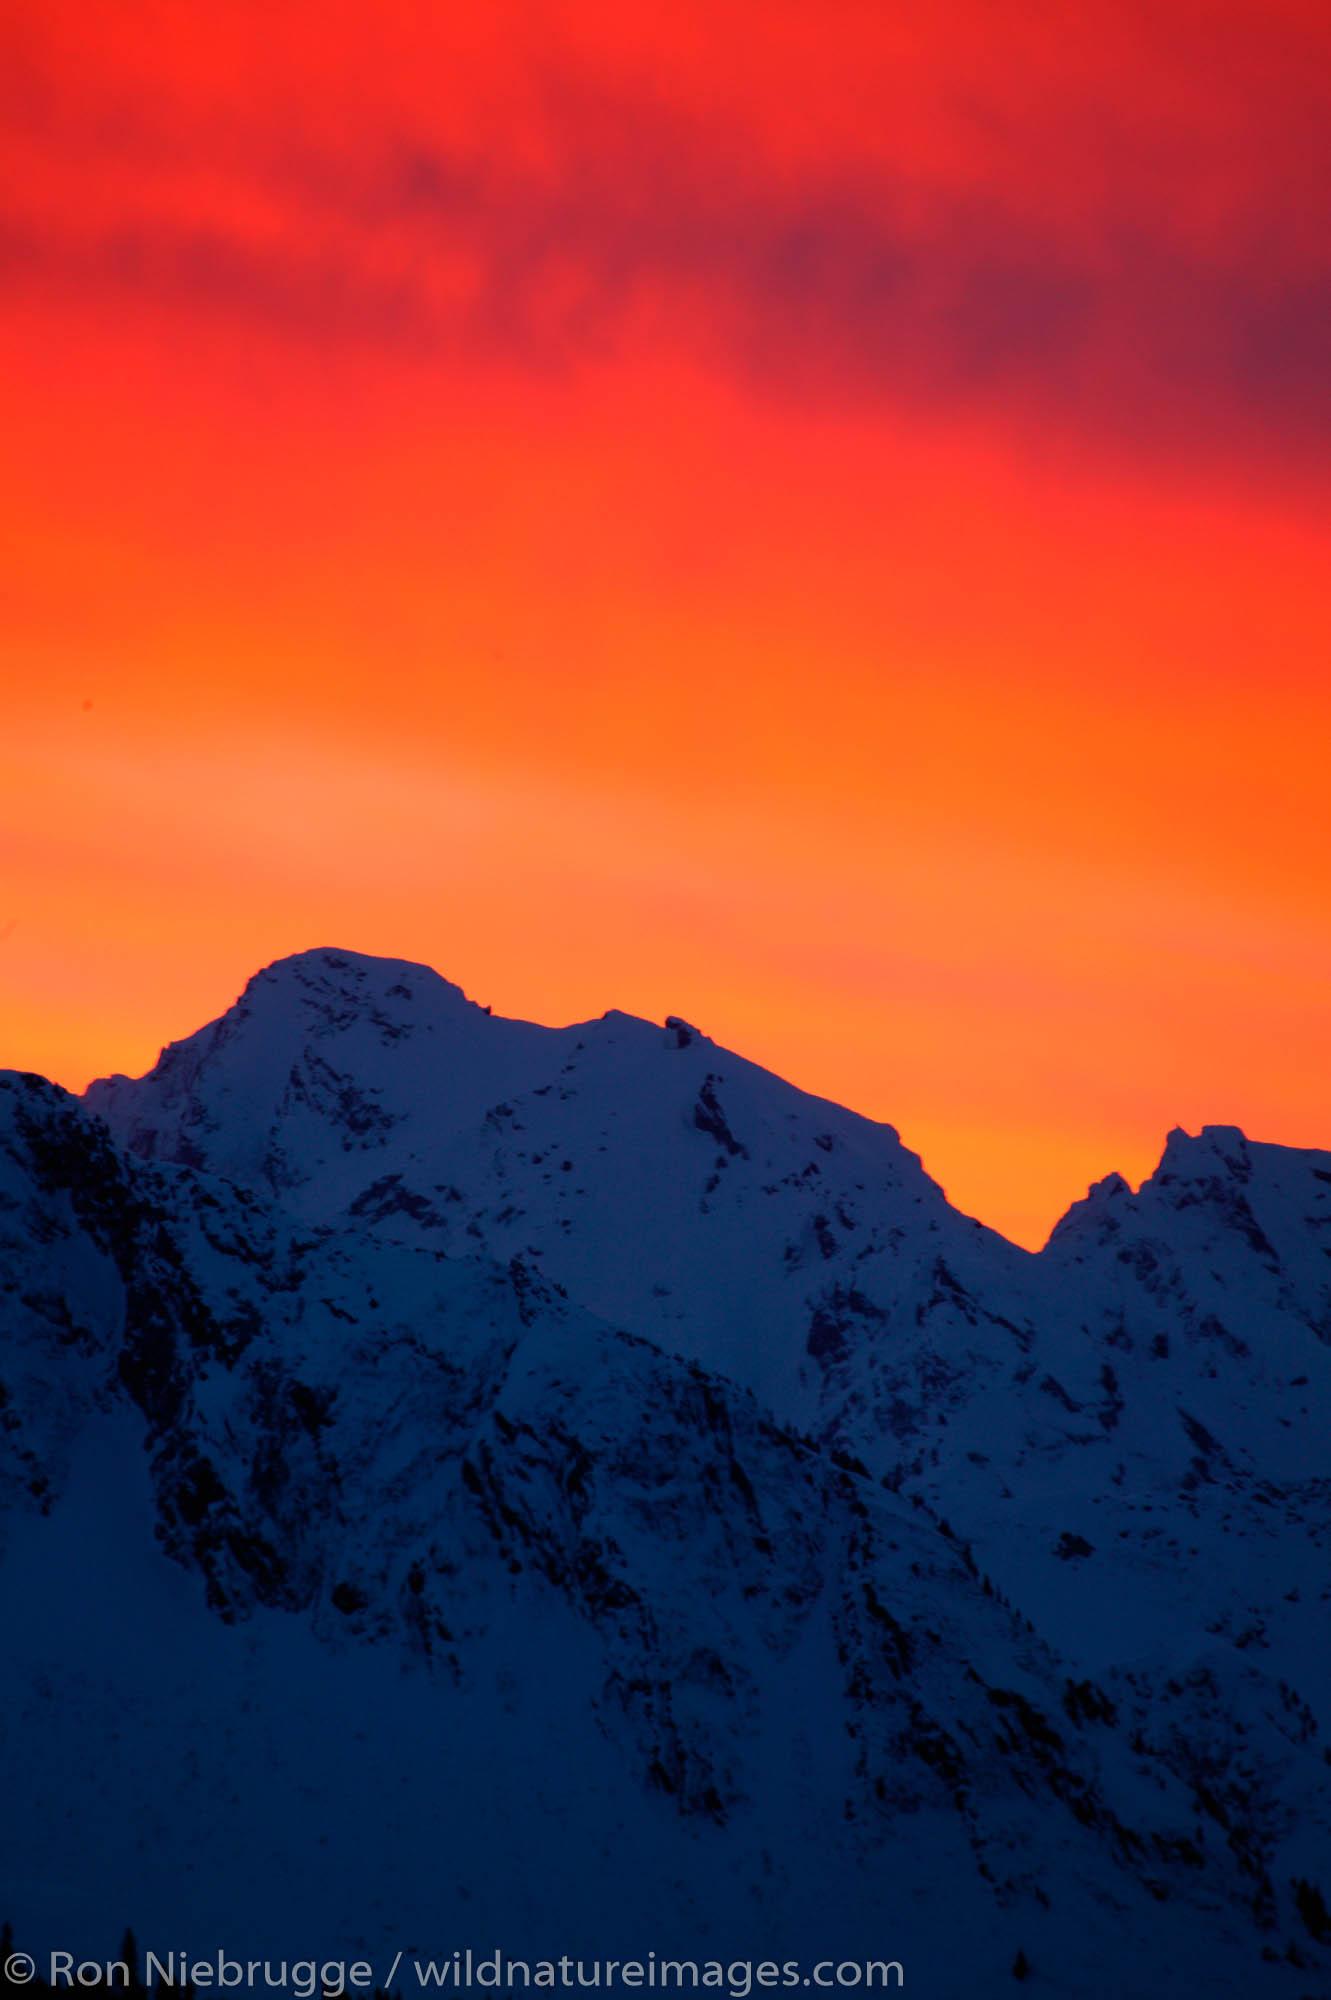 Sunrise from Seward over the Resurrection Peninsula, Chugach National Forest, Alaska.